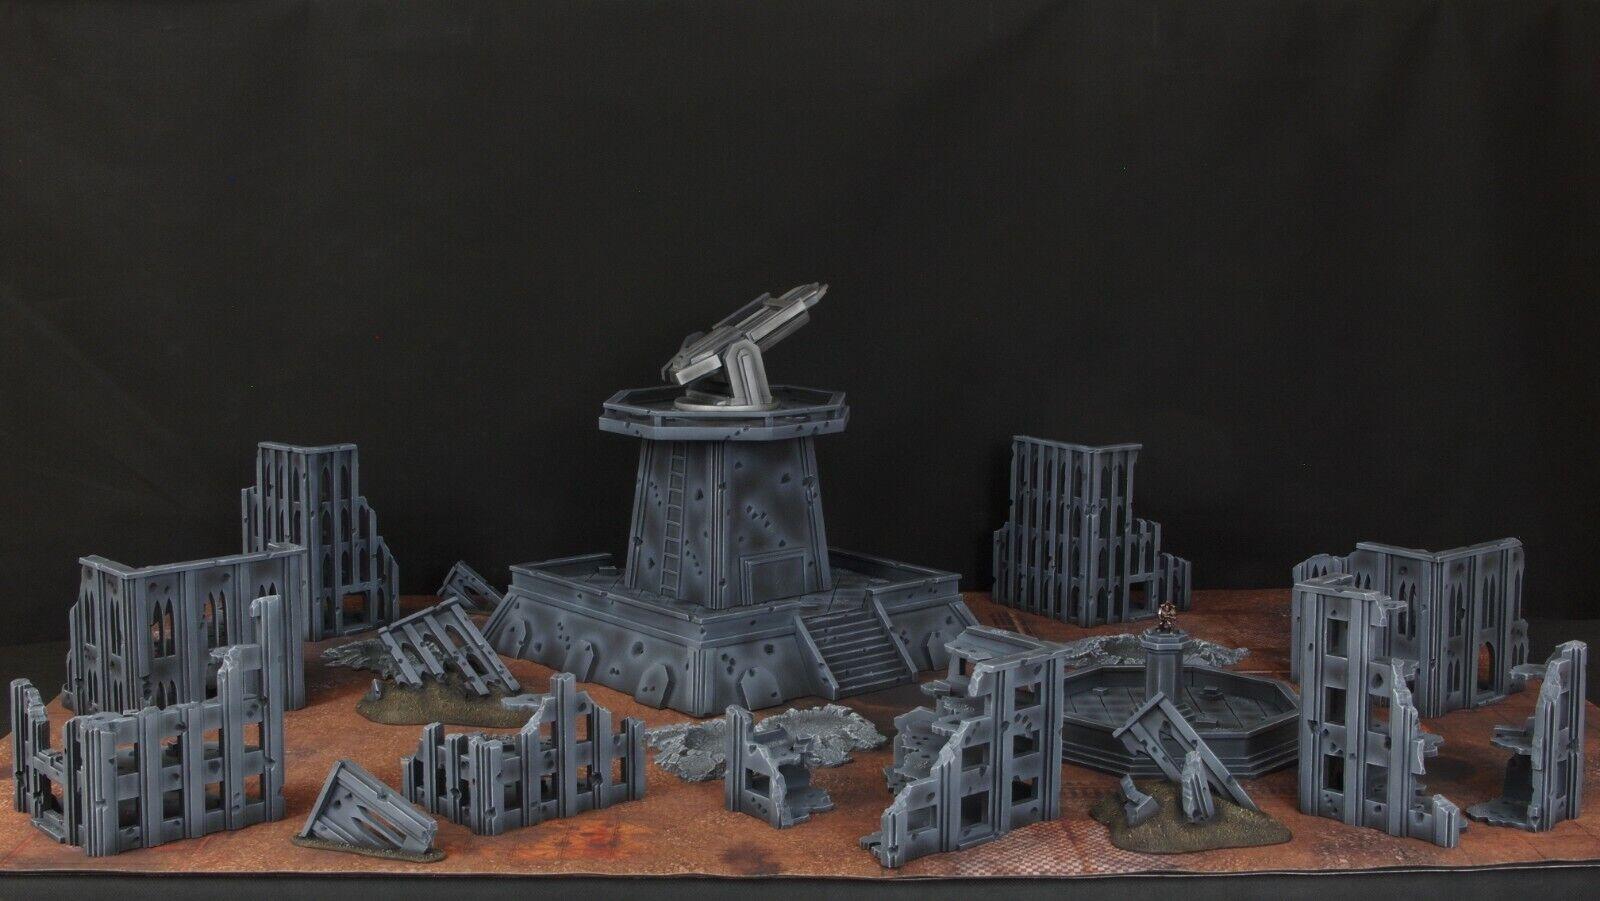 Anti Orbital Cityfight (pictures in description)